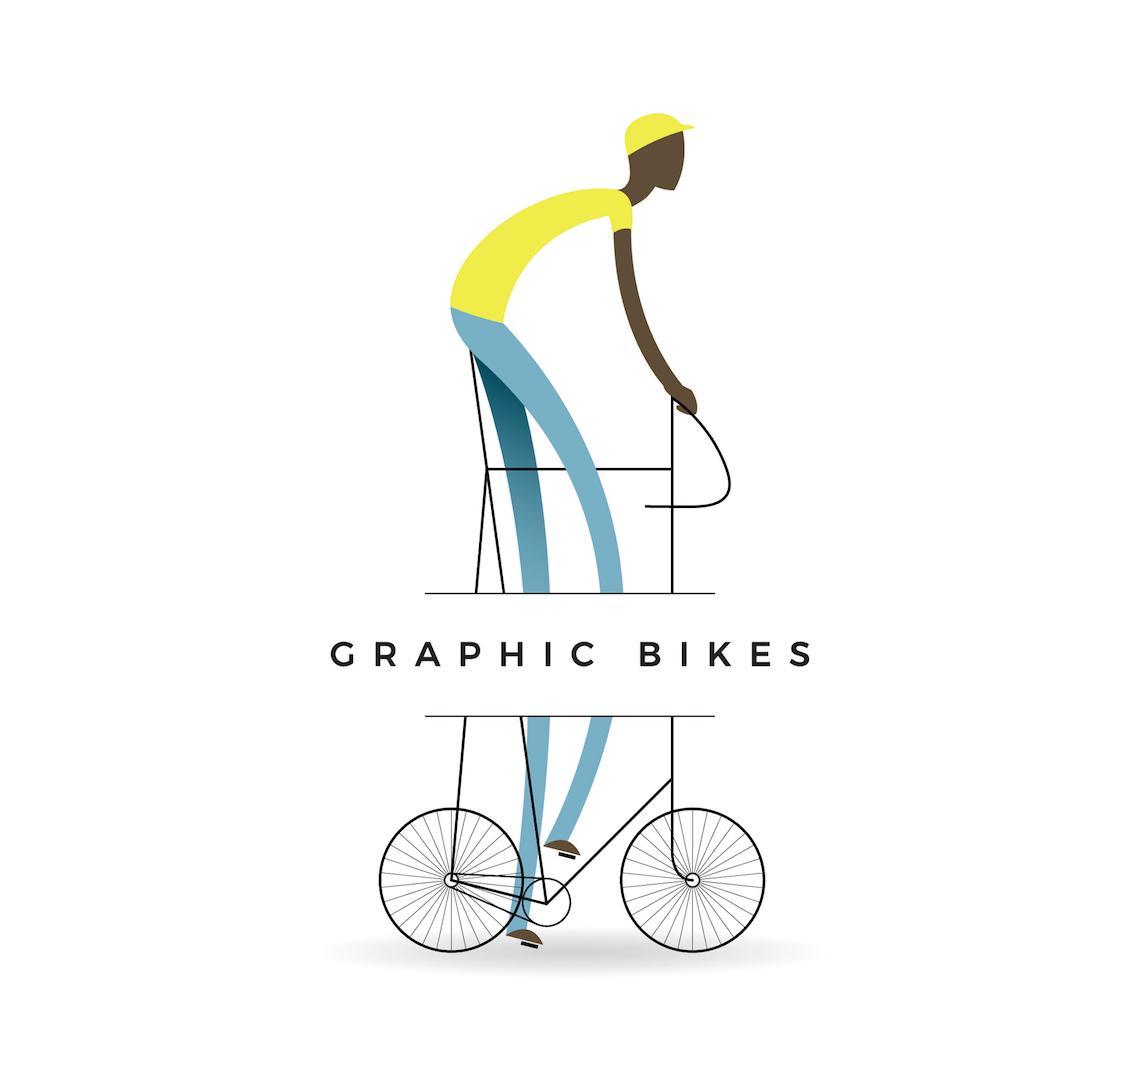 Grahic Bikes by Jo s'illustre_1